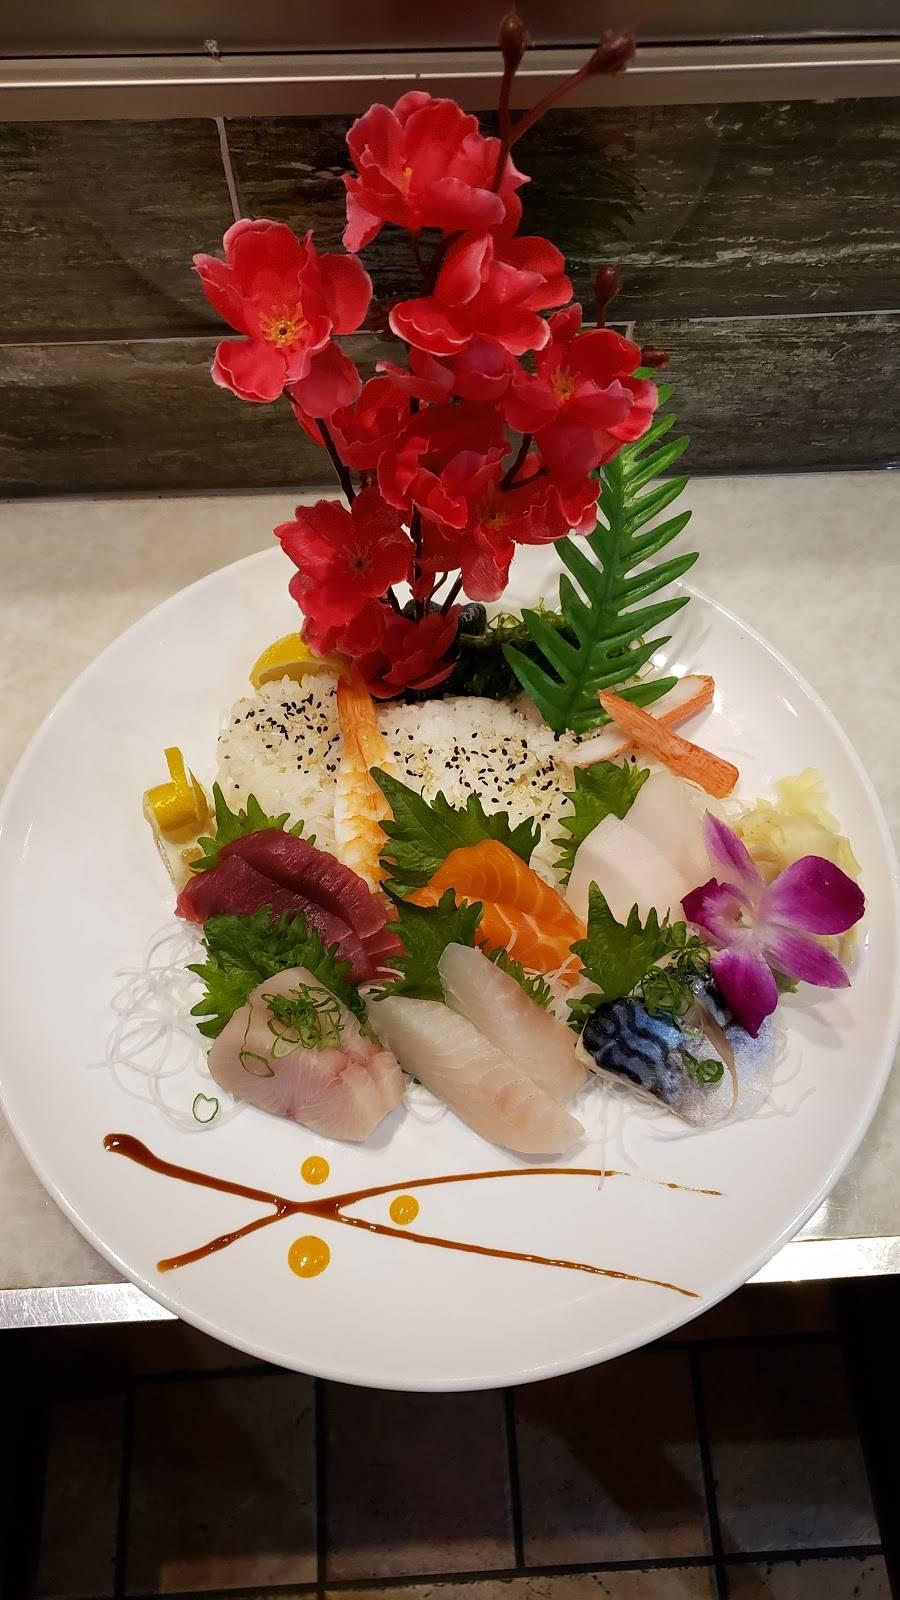 Lucky Star | restaurant | 731 NY-211 Ste 107, Middletown, NY 10941, USA | 8456928989 OR +1 845-692-8989